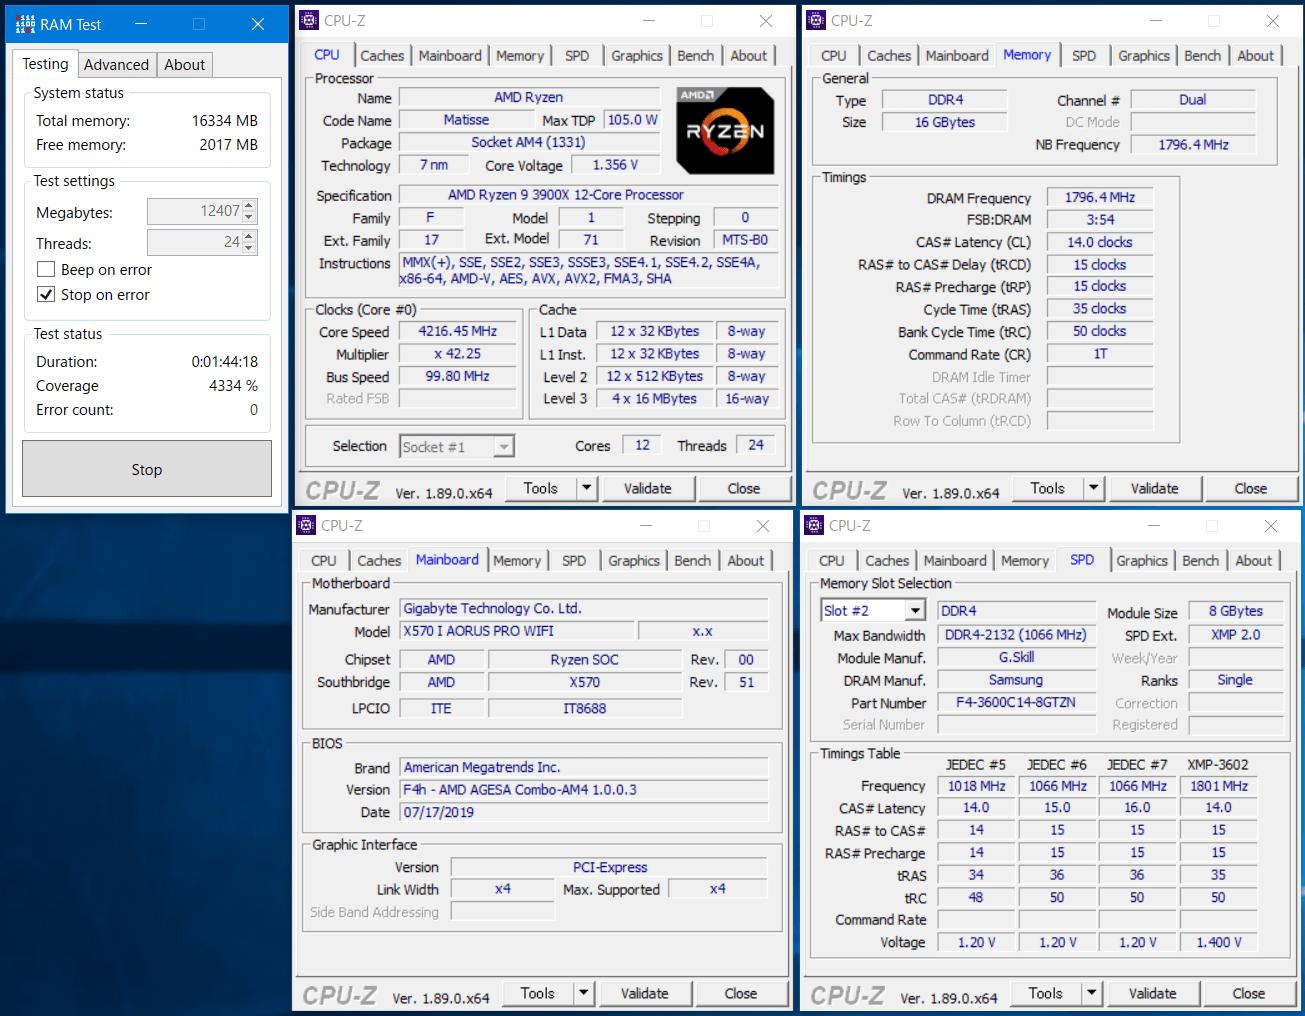 F4-3600C14Q-32GTZN_GIGABYTE X570 I AORUS PRO WIFI_RAM Test